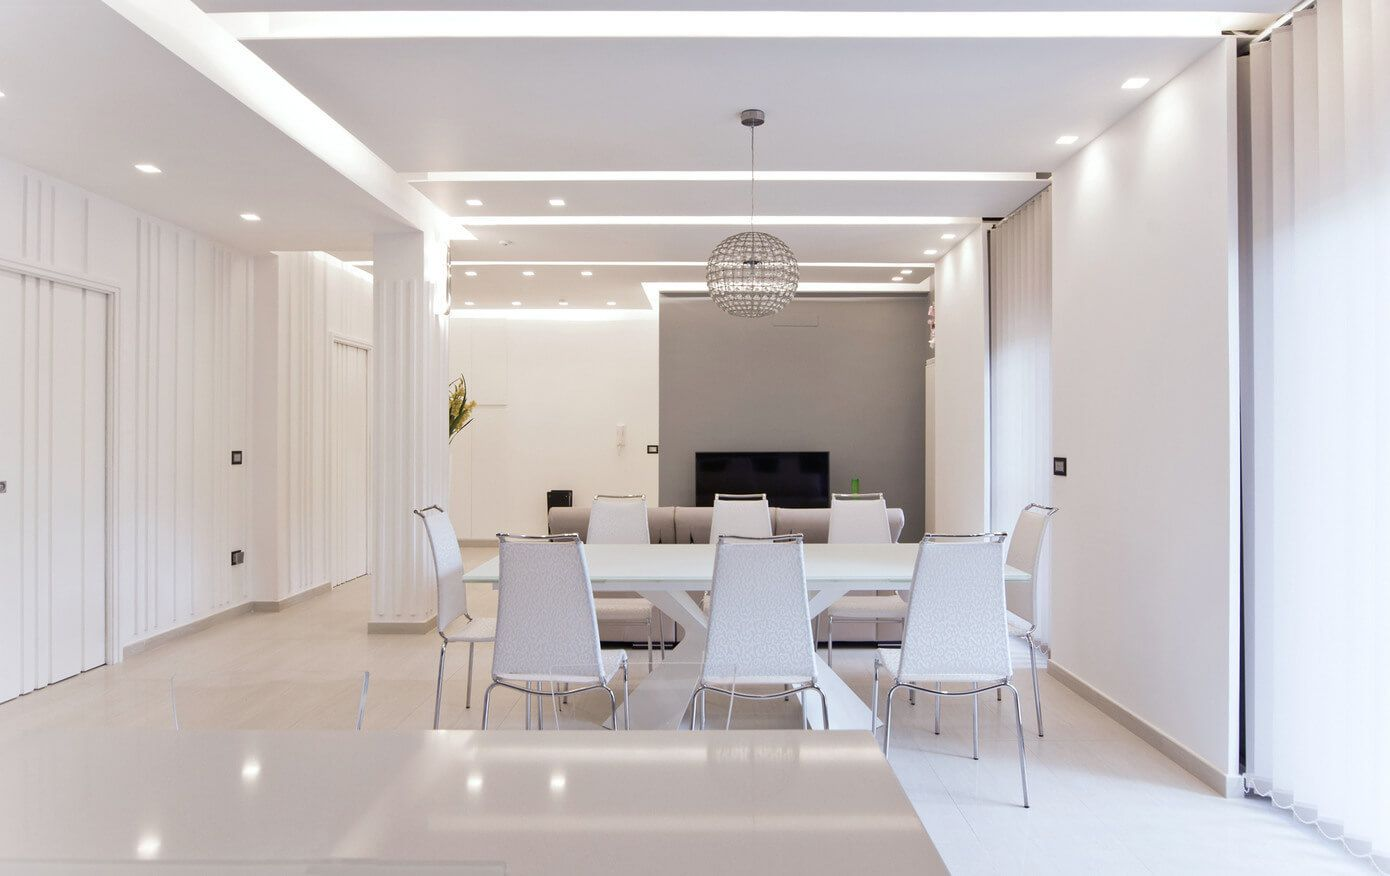 Interior-I--by-b2c-architects-02